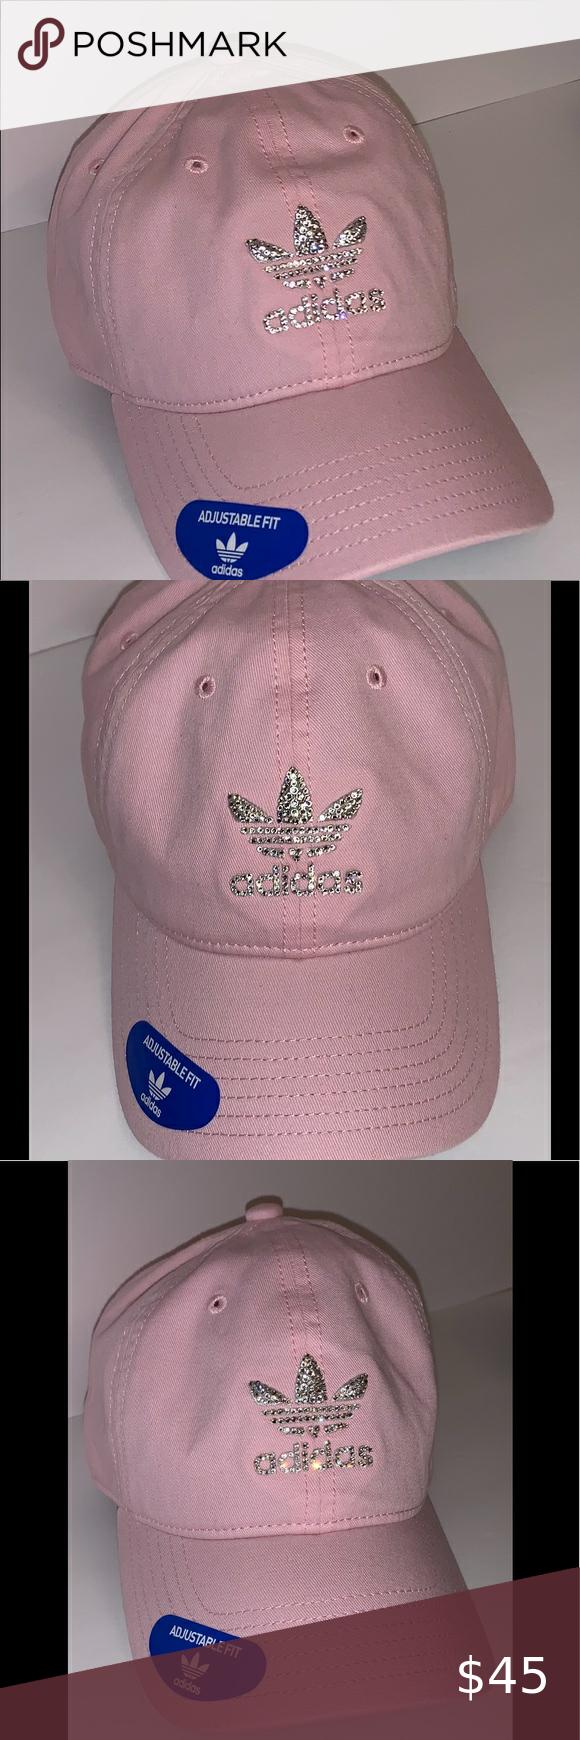 Adidas Swarovski Pink Hat Pink Hat Adidas Originals Women Pink Adidas